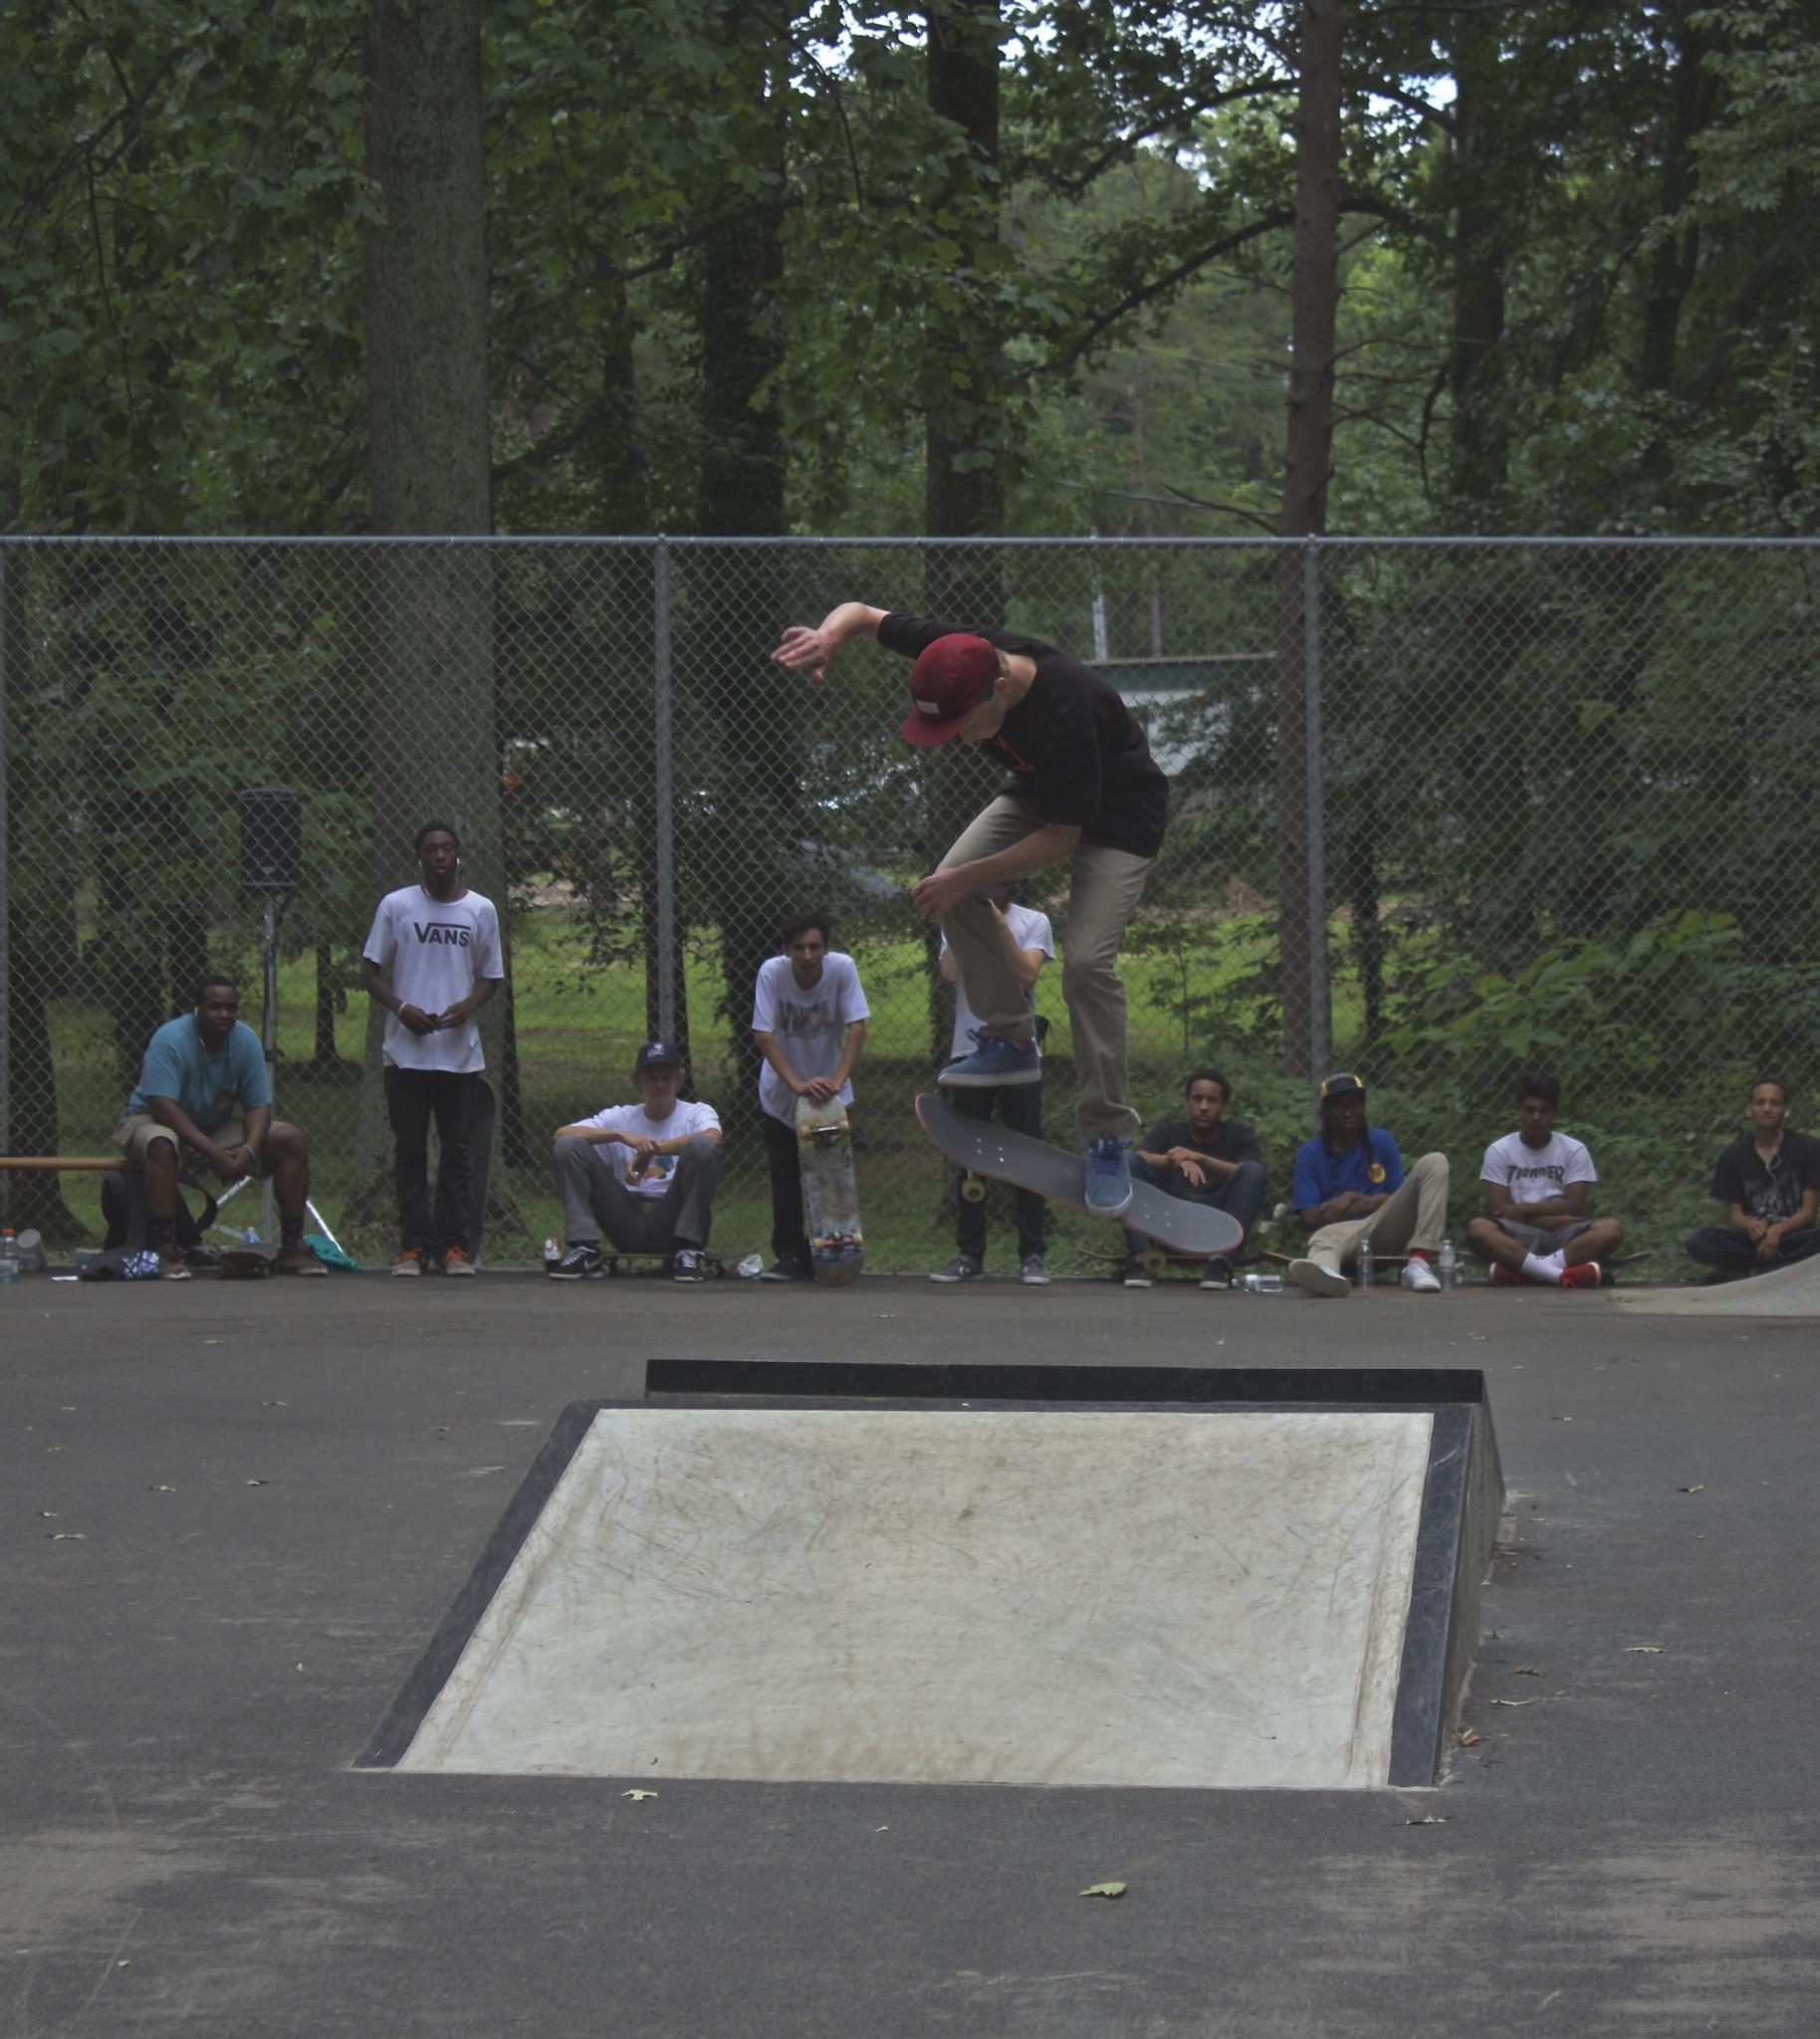 Skateboarding by grant.berkley